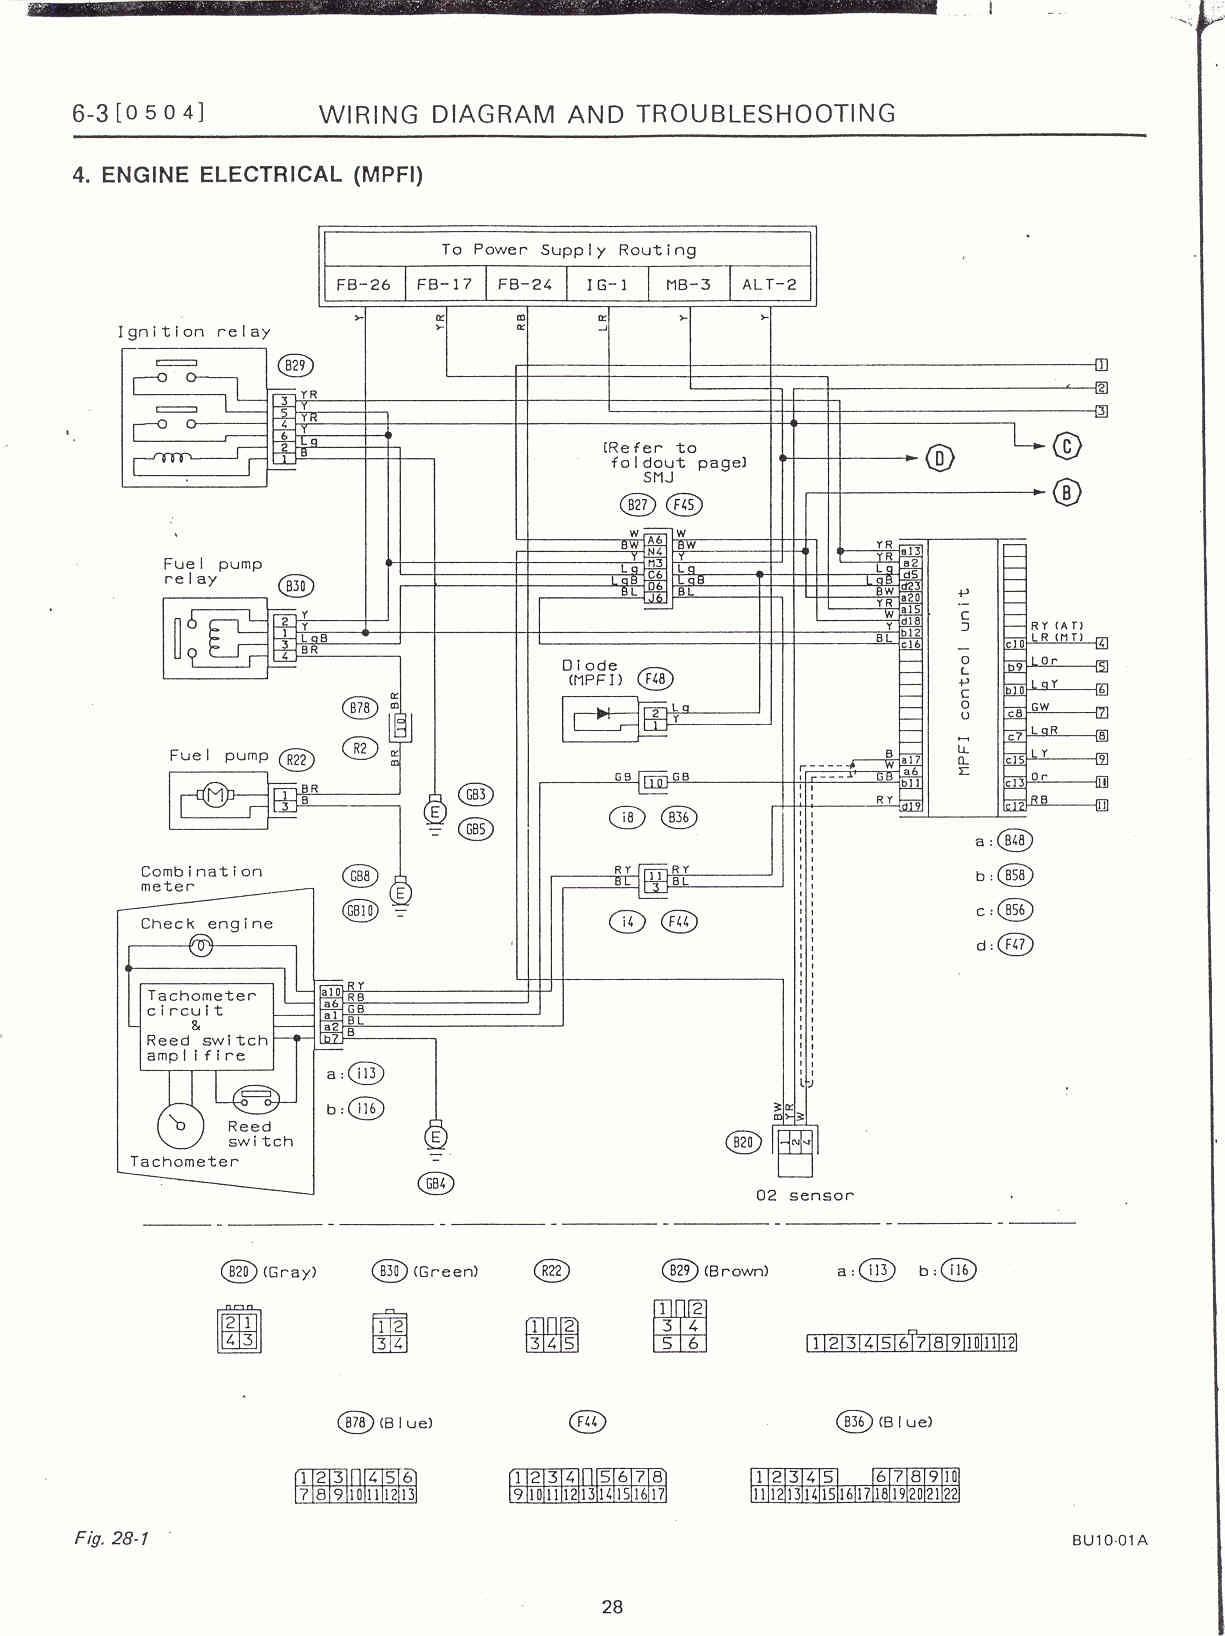 Ej205 Swap 2 5 Rs Wiring Diagram